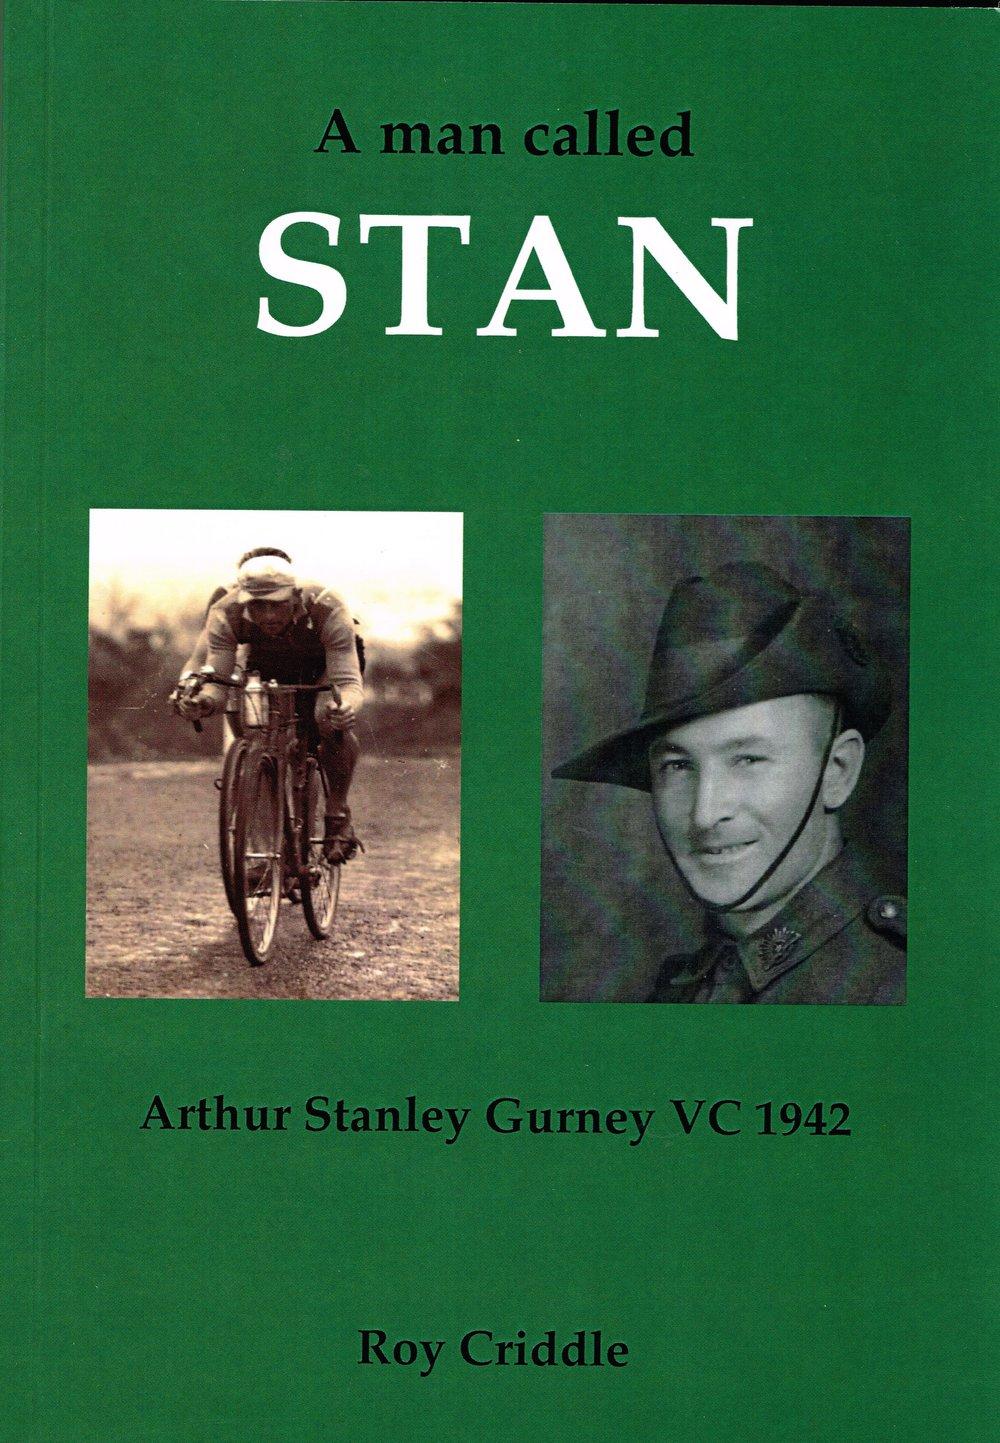 A man called Stan :Arthur Stanley Gurney VC 1942 Roy Criddle